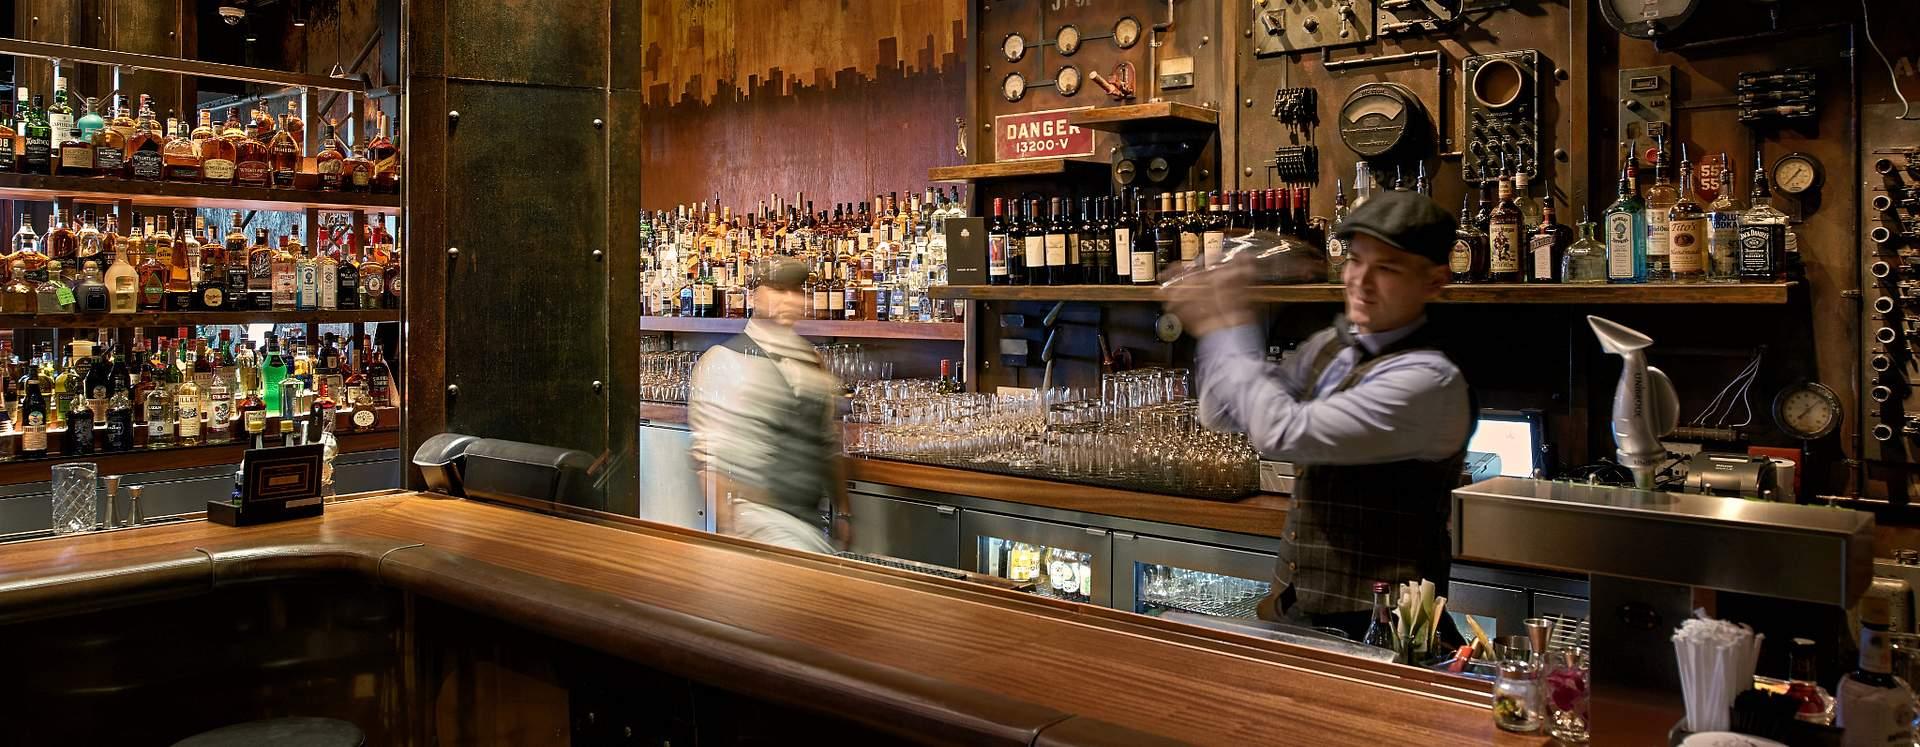 Bartender mixing drinks behind bar at The Edison at Disney Springs